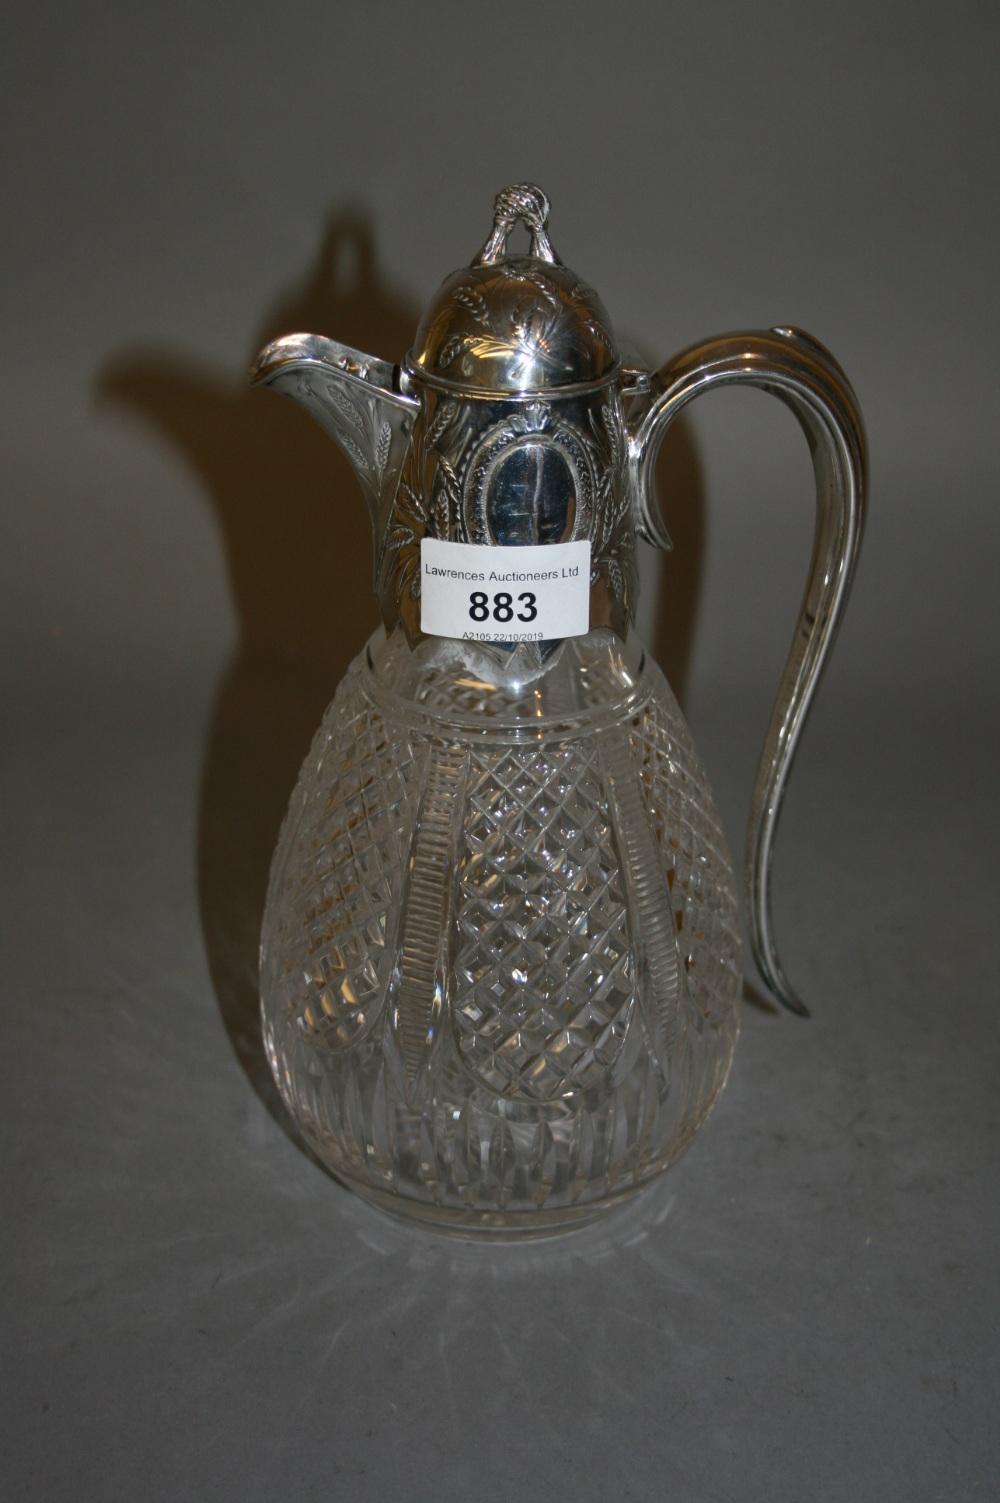 Lot 883 - Victorian silver mounted cut glass claret jug, Birmingham, 1877